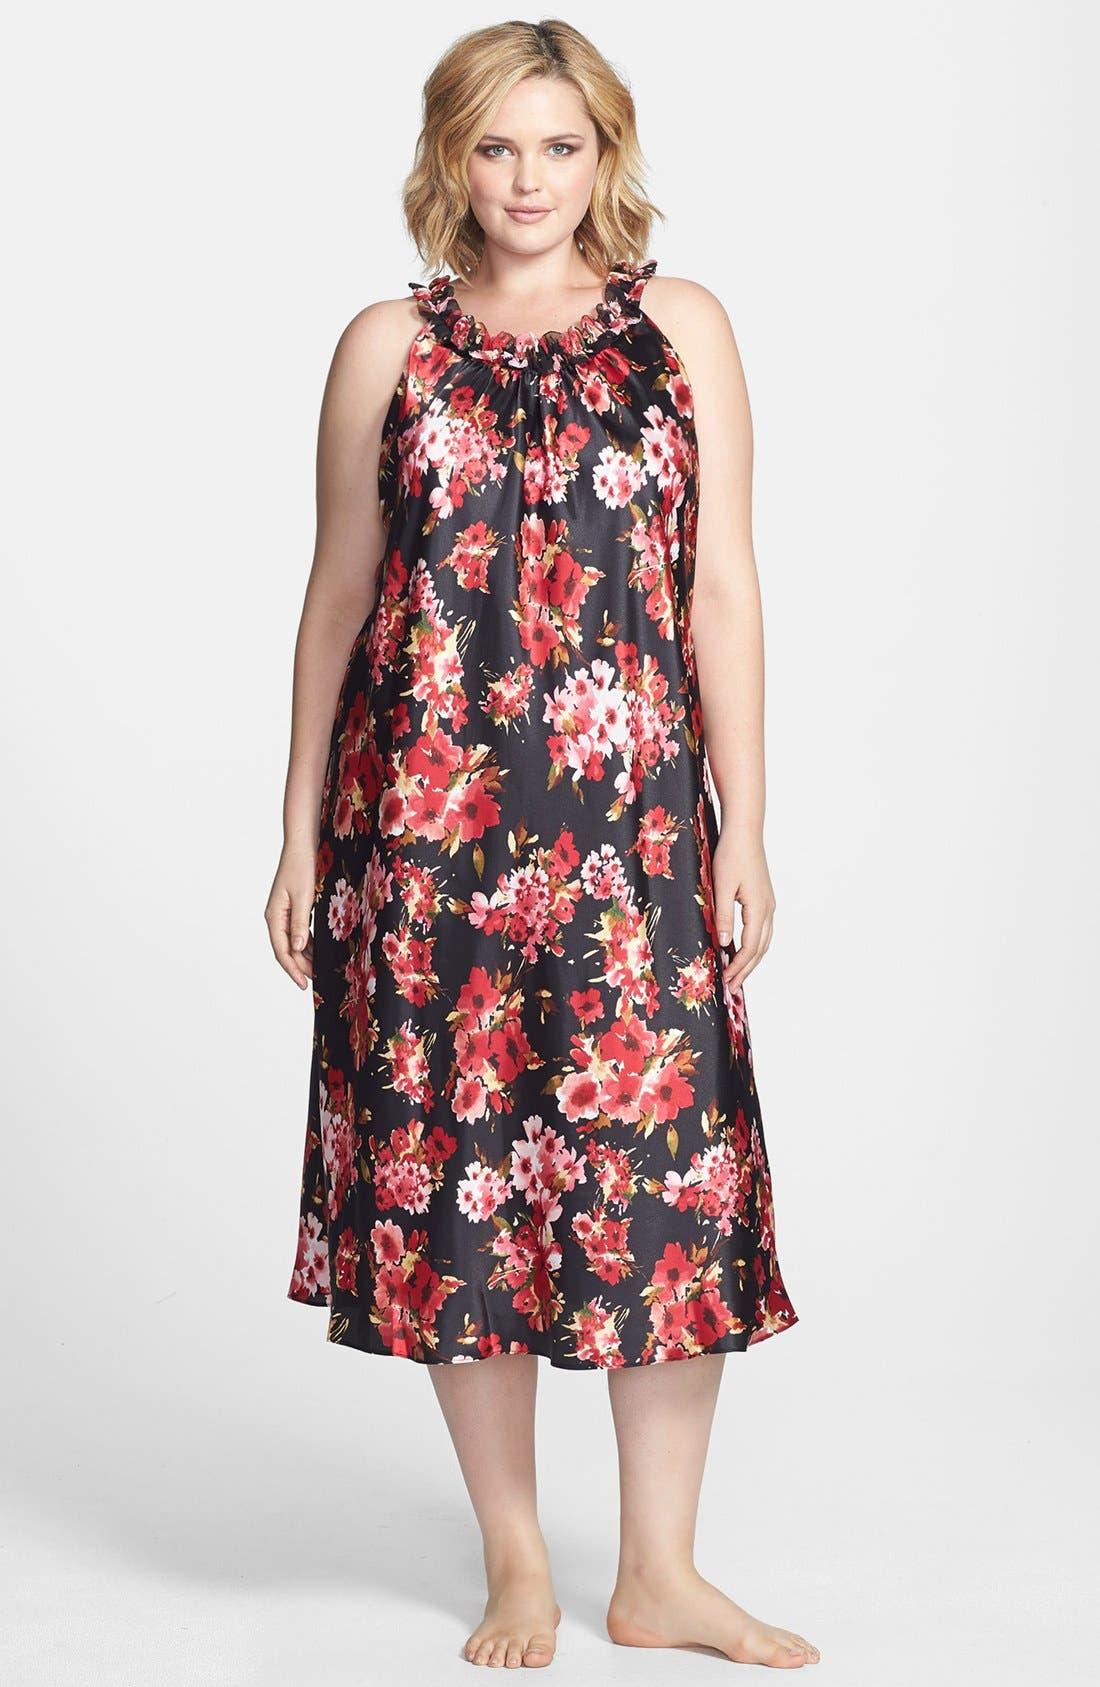 Main Image - Oscar de la Renta Sleepwear 'Holiday Bouquet' Long Nightgown (Plus Size)